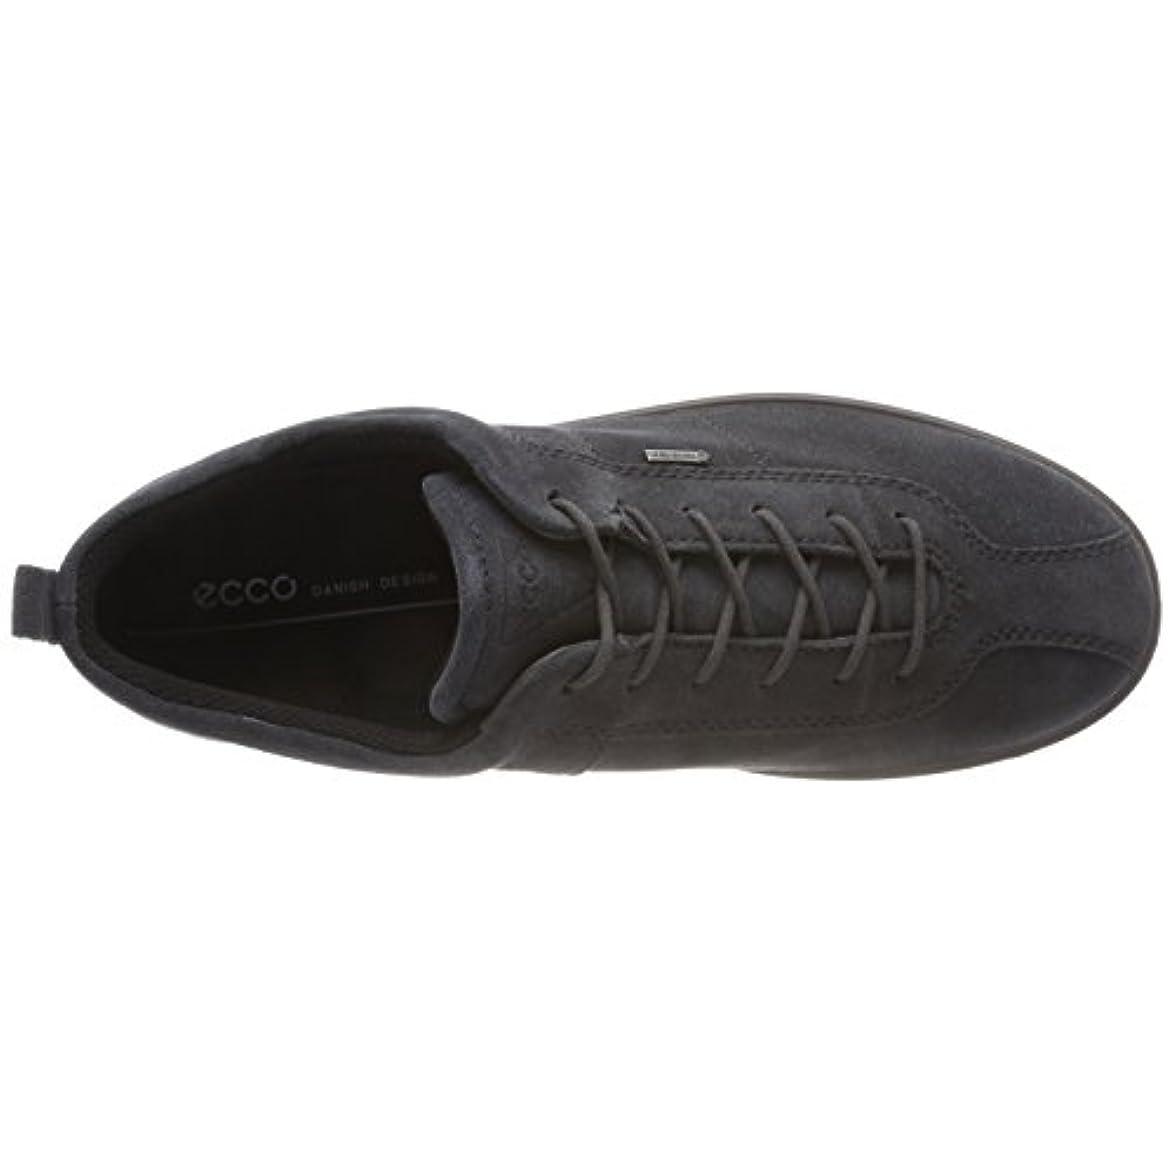 Ecco Soft 1 Ladies Sneaker Donna